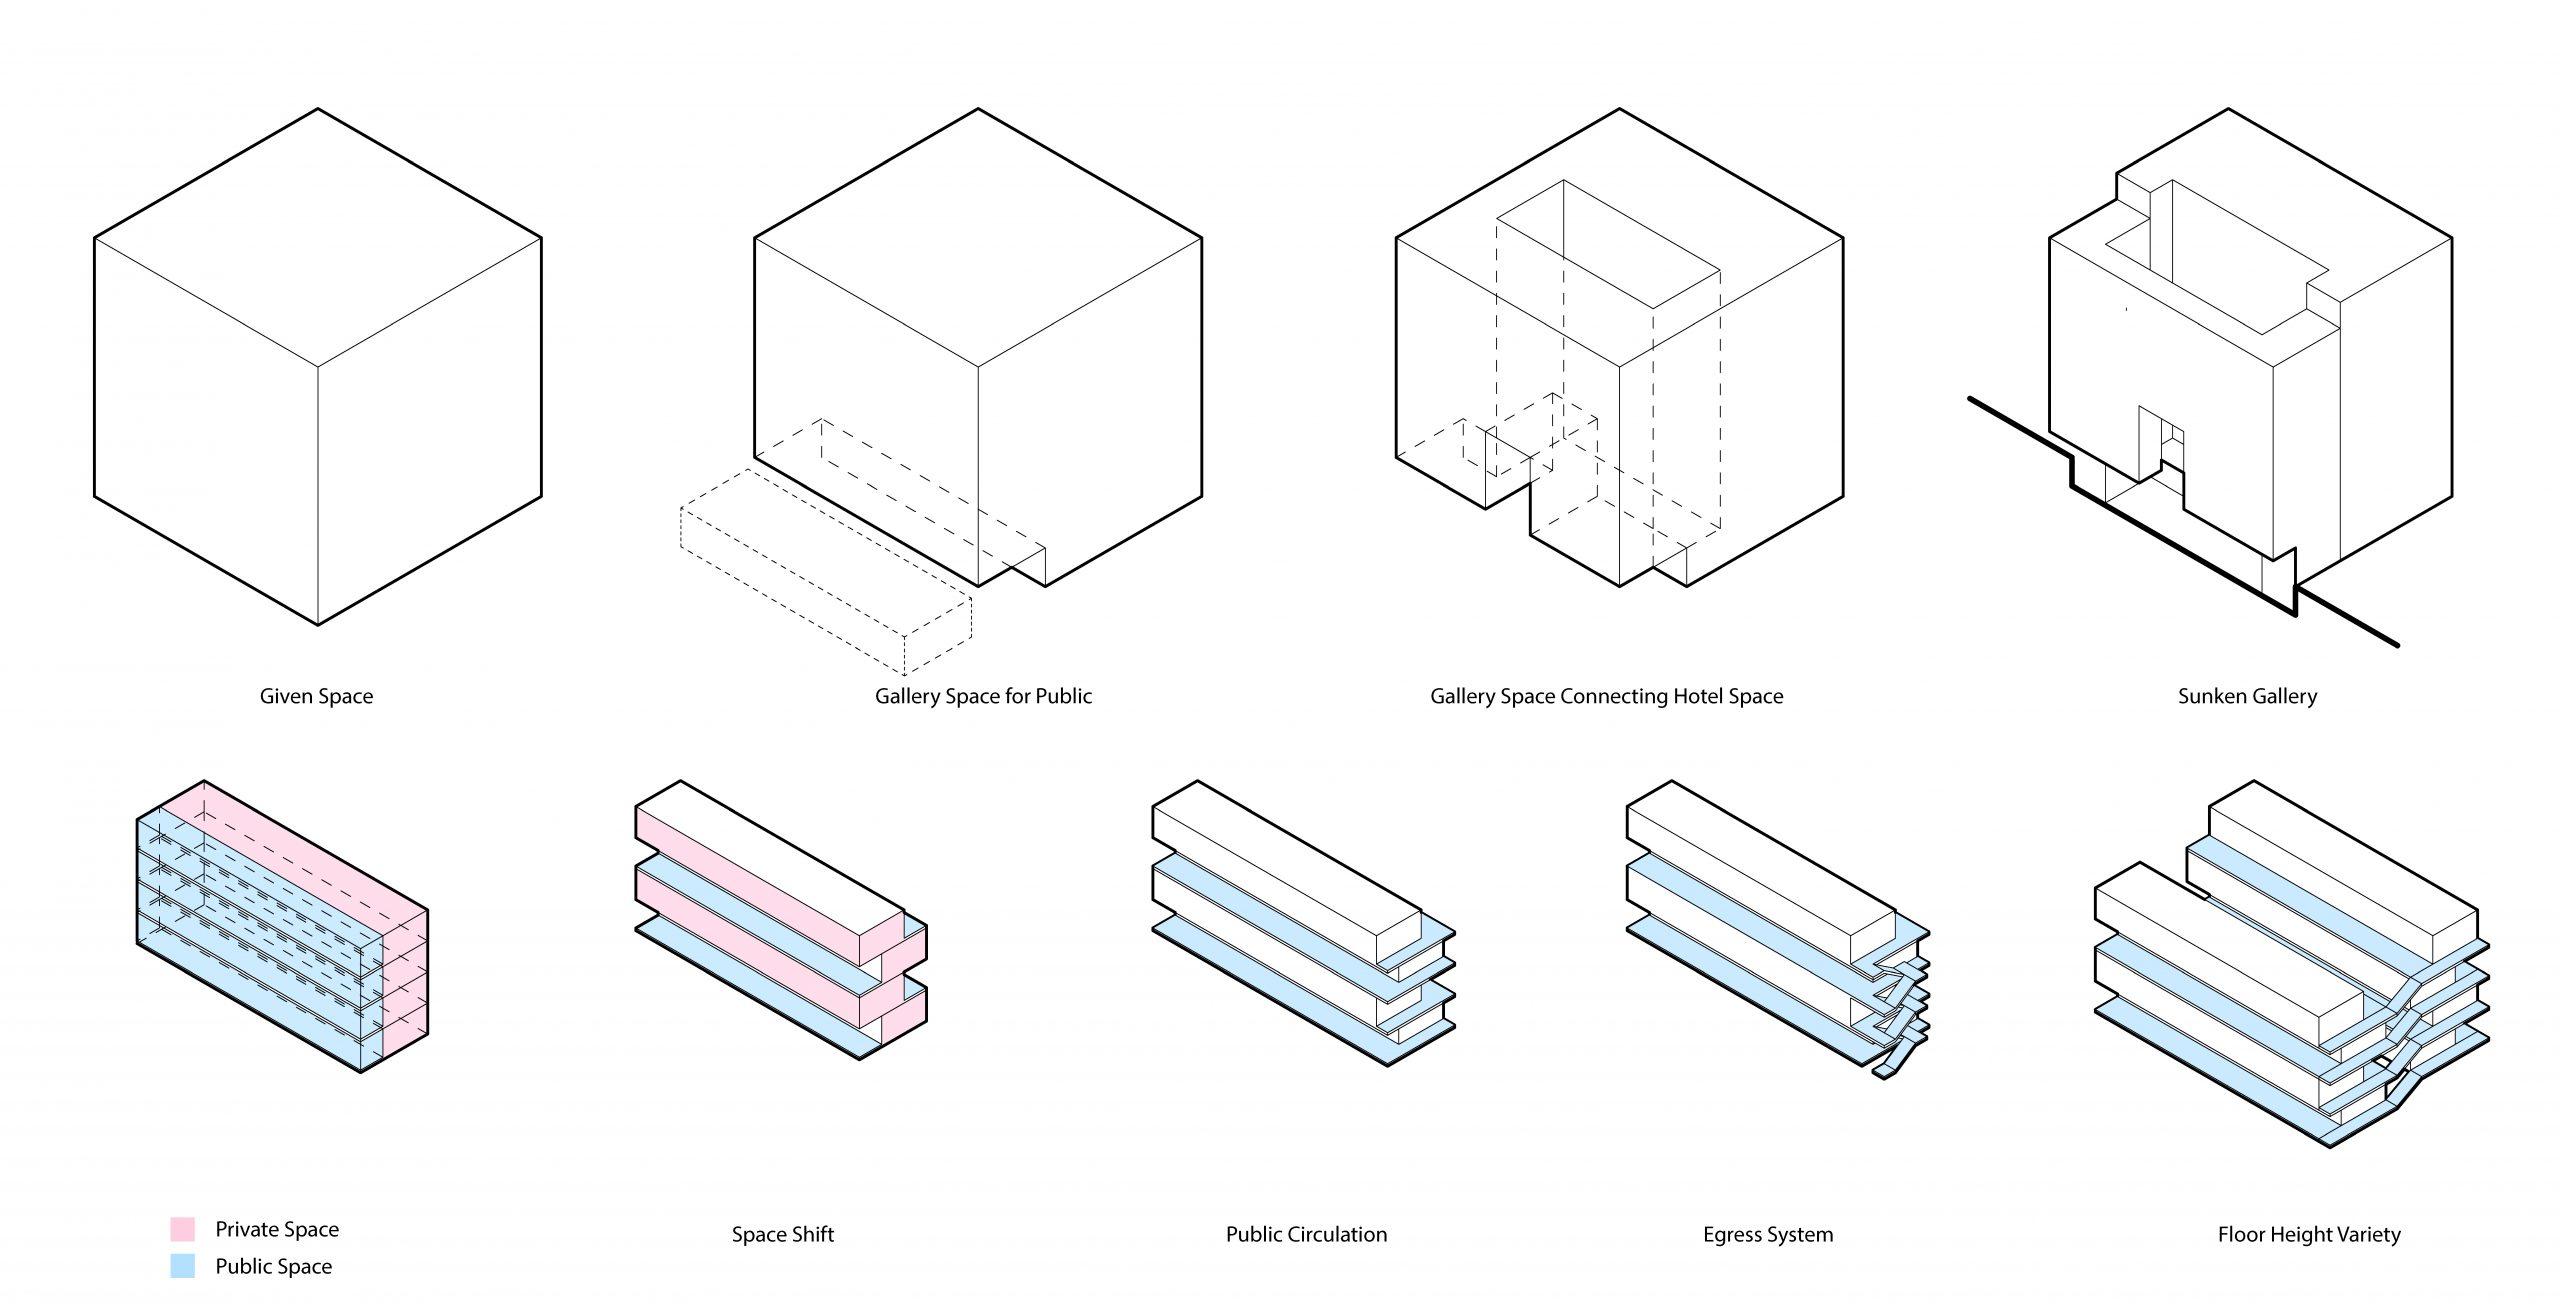 Building massing diagrams